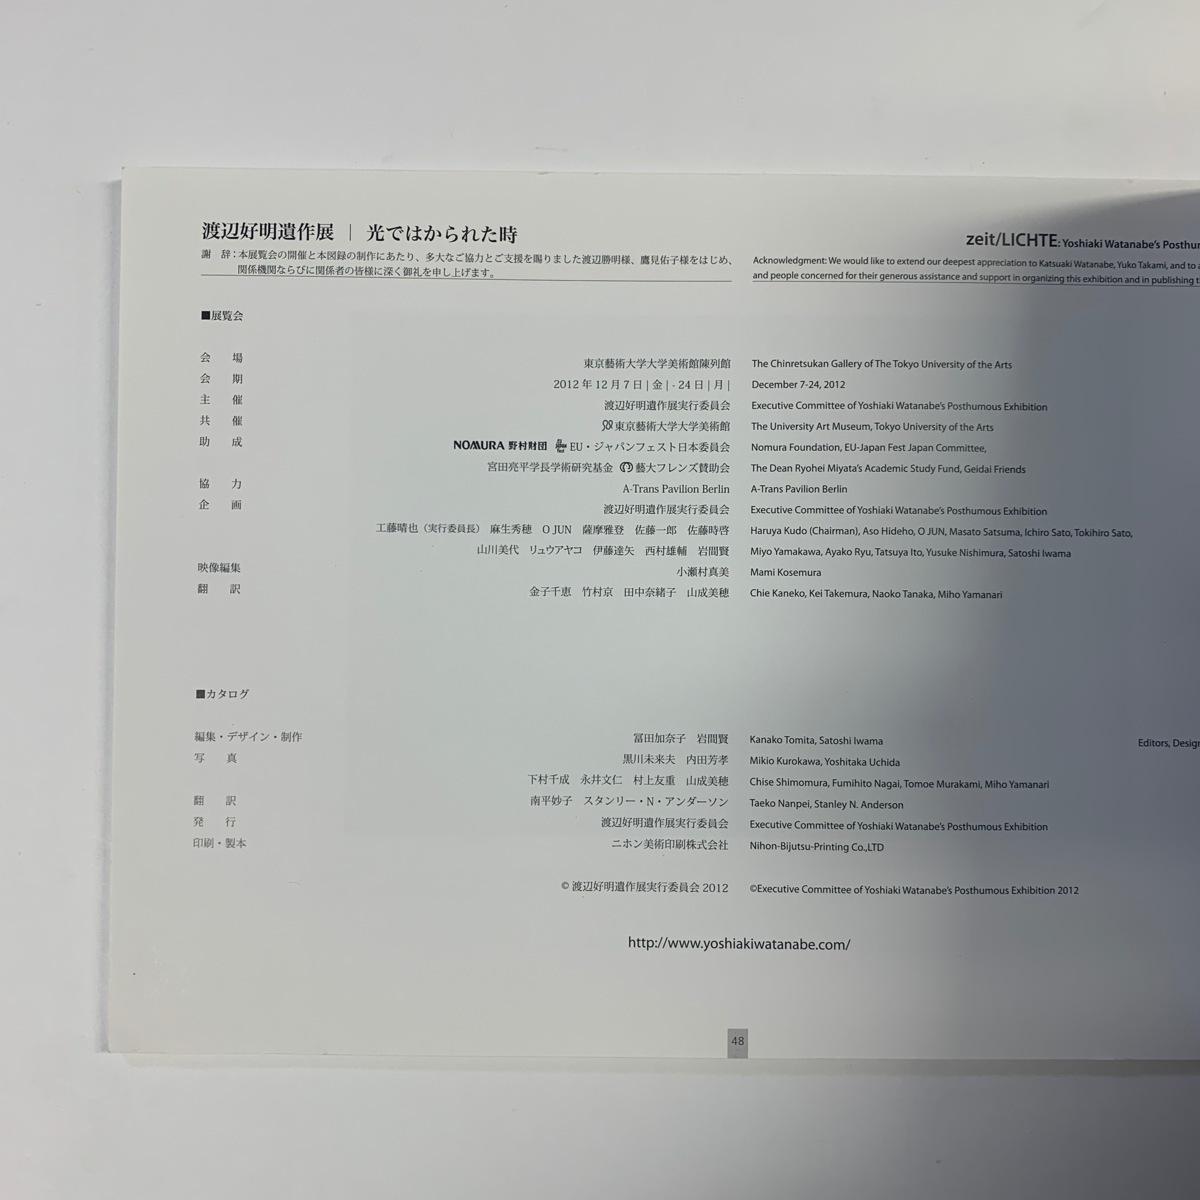 zeit / LIGHTE 渡辺好明遺作展 光ではかられた時 2012年 東京芸術大学美術館陳列館 <ゆうメール>_画像7